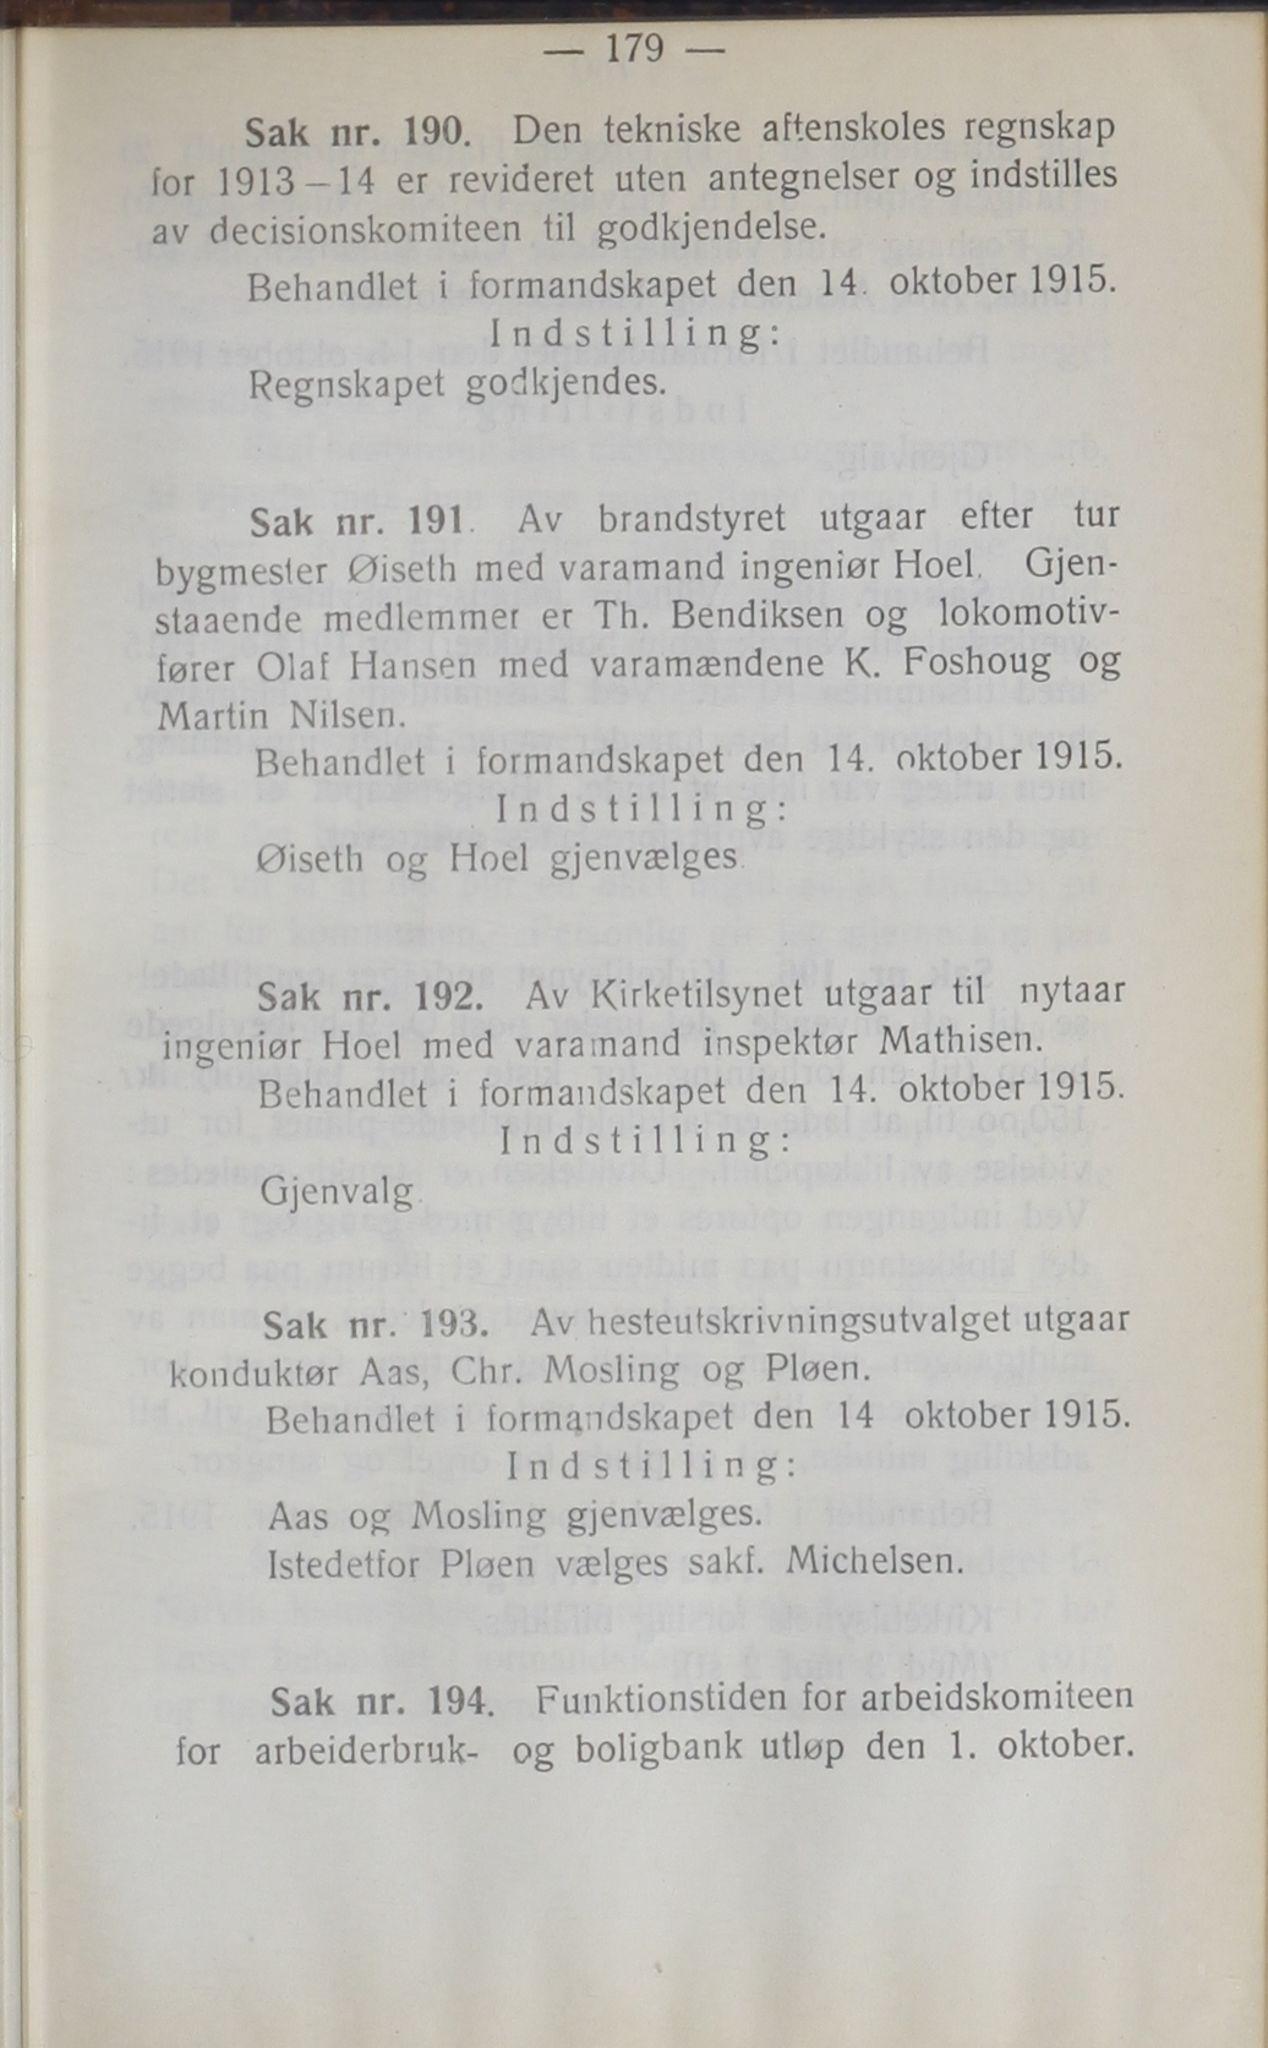 AIN, Narvik kommune. Formannskap , A/Ab/L0005: Møtebok, 1915